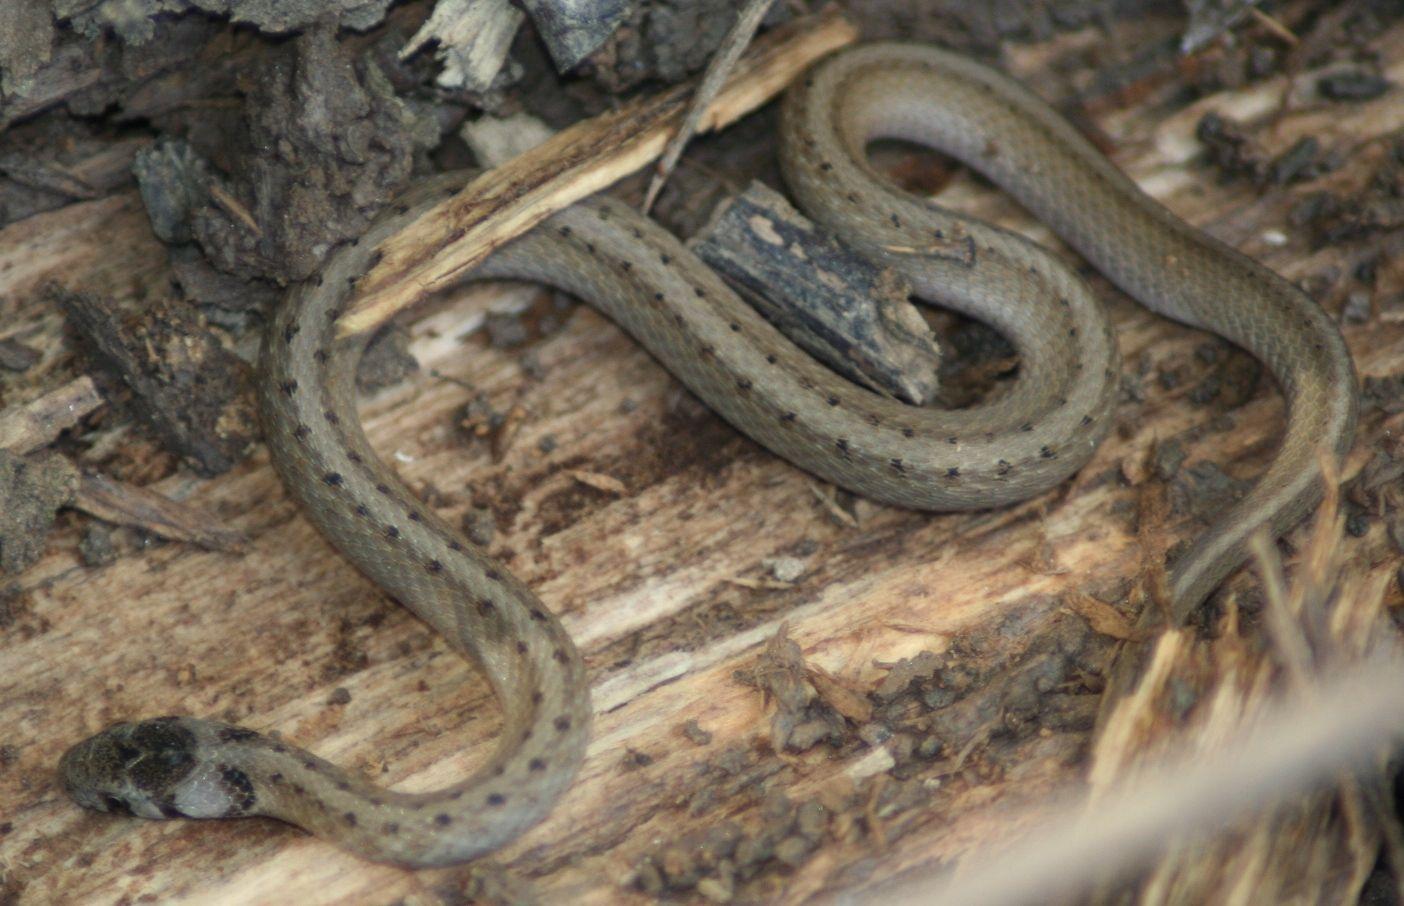 Snake Brown Snake Storeria Dekayi Subfamily Natricinae